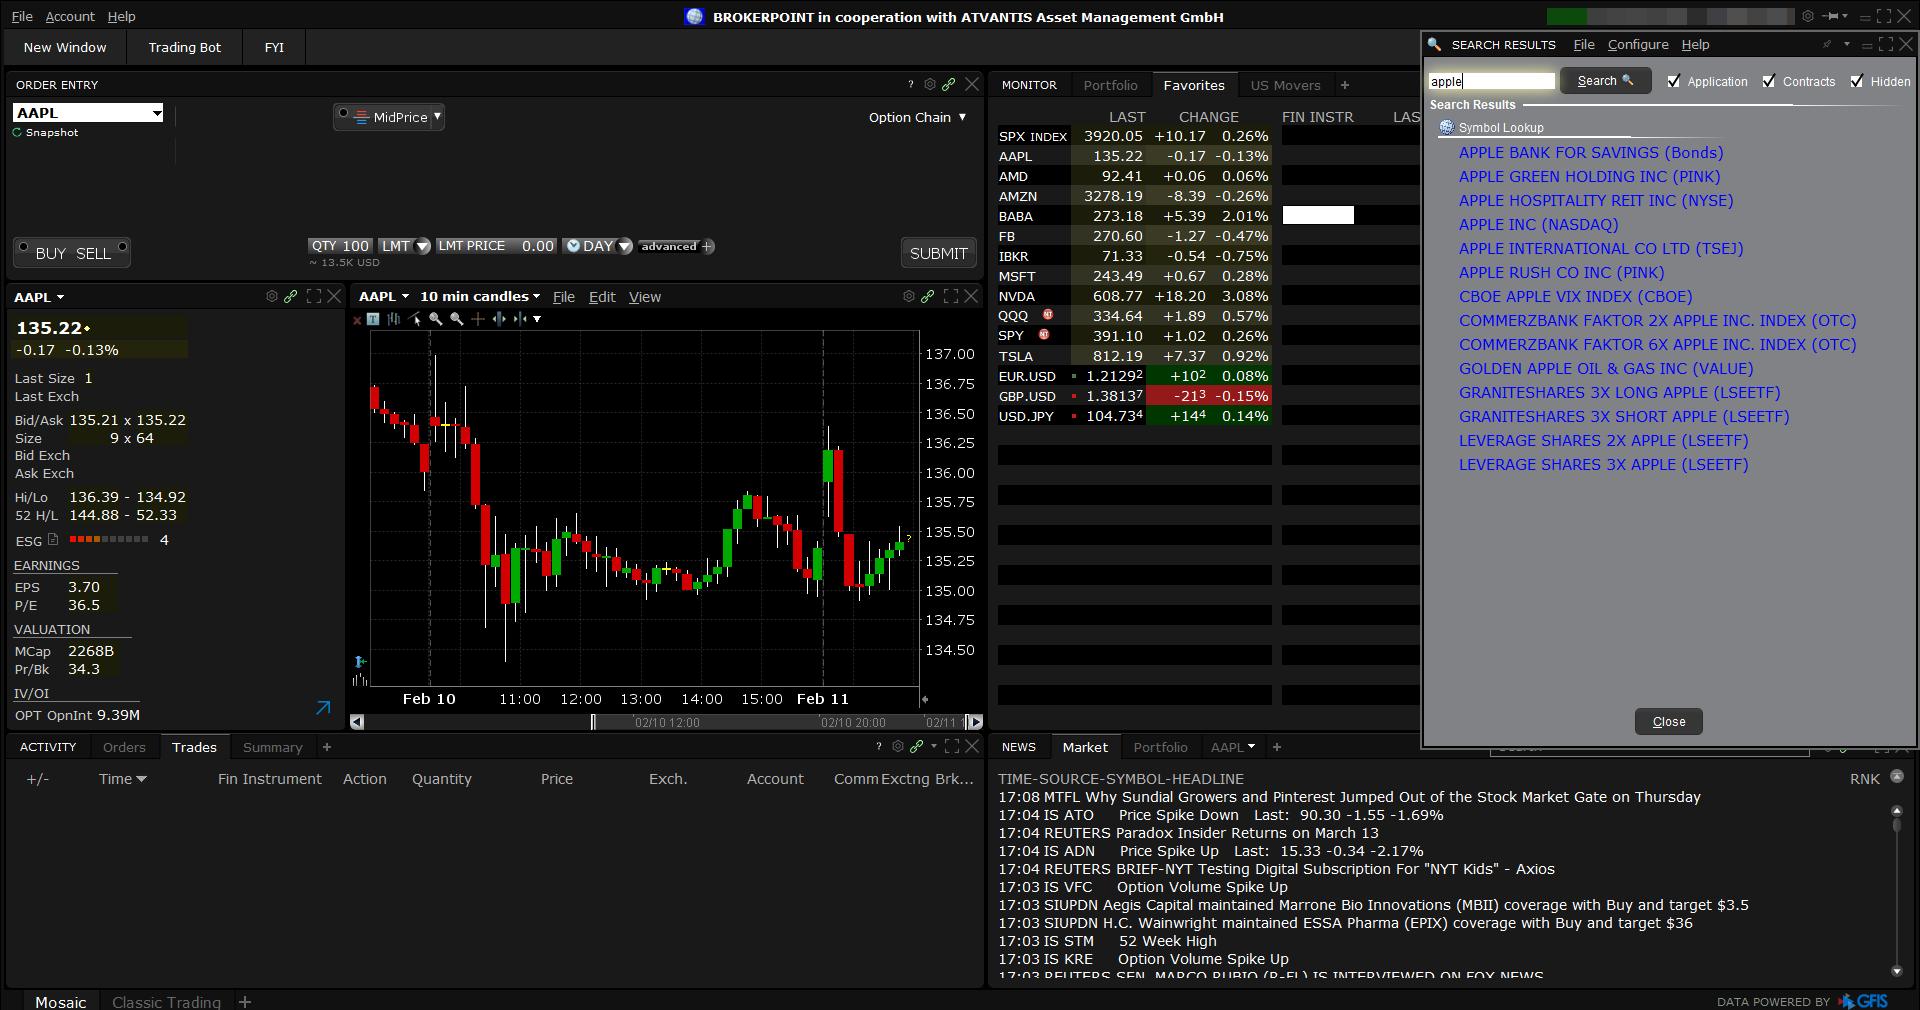 Brokerpoint review - Desktop trading platform - Search